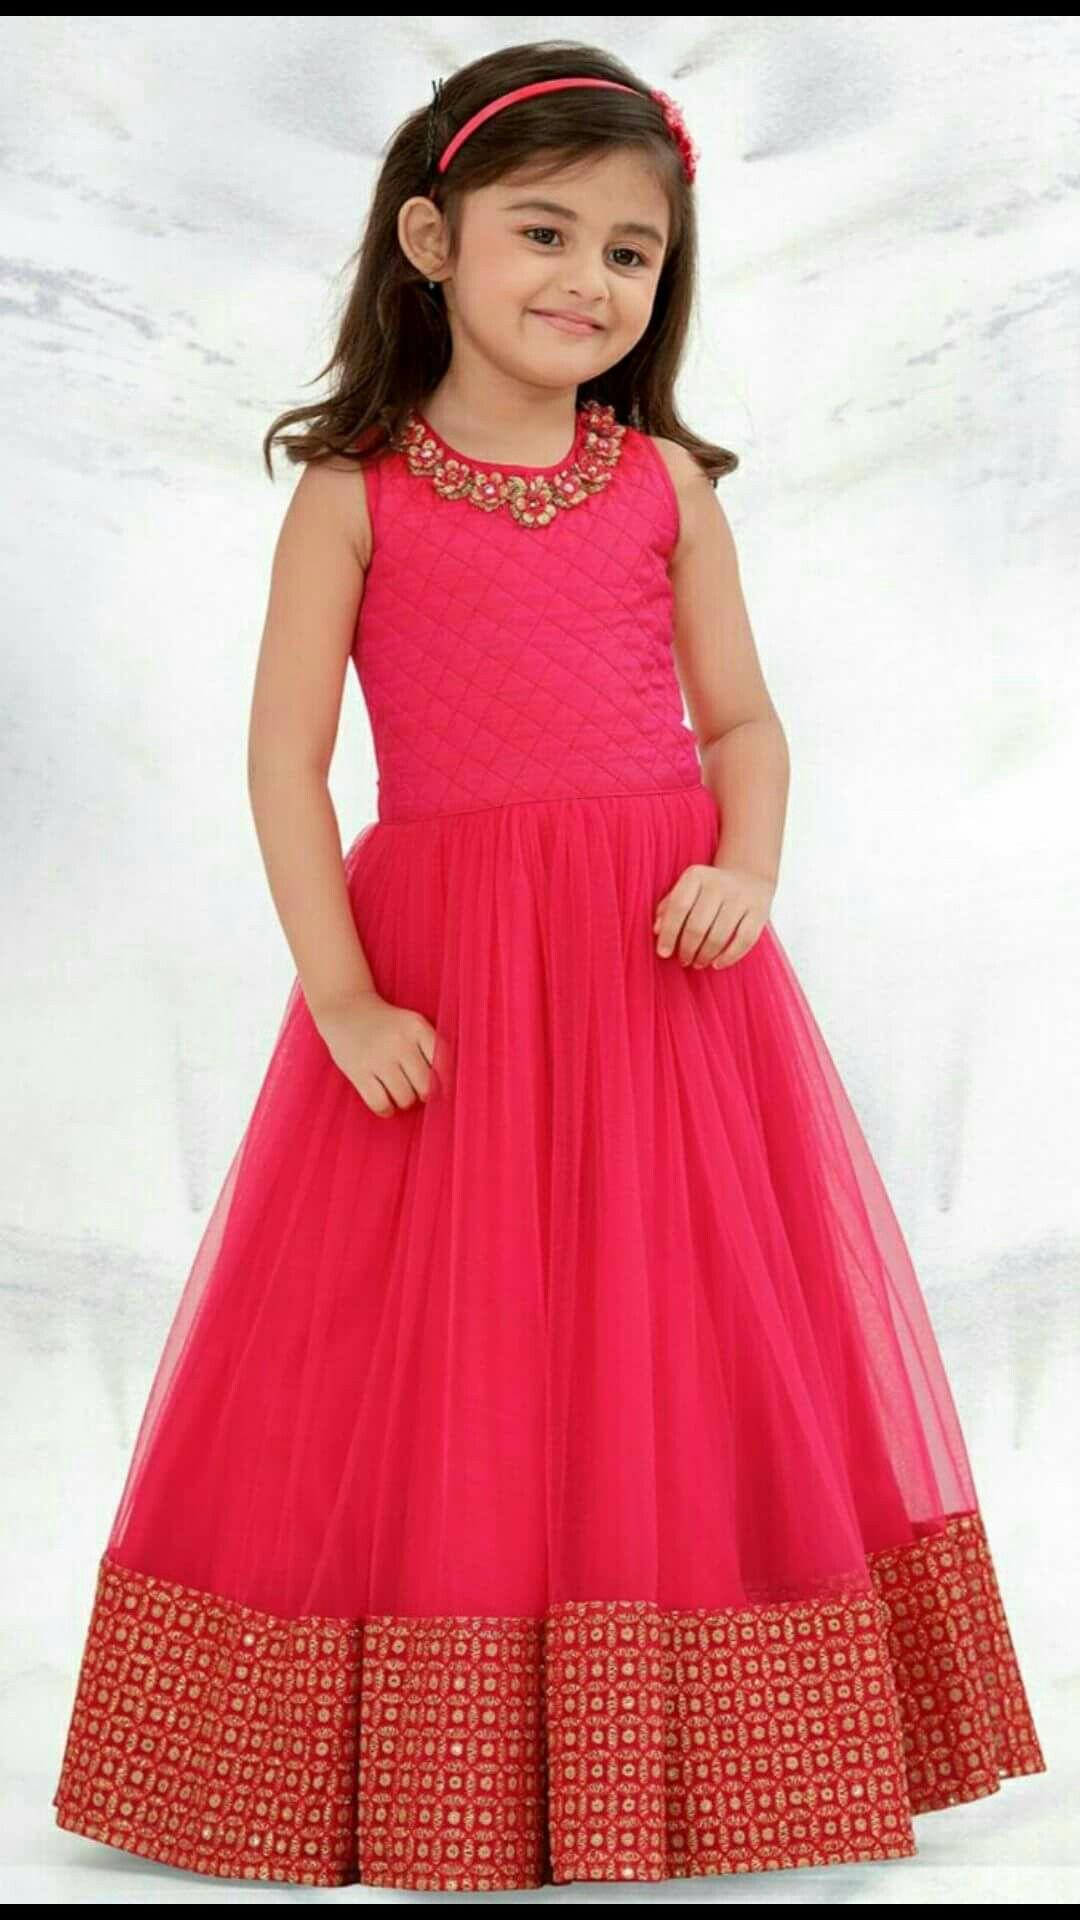 هدايا للأطفال عمر 10 سنوات ـ الفساتين